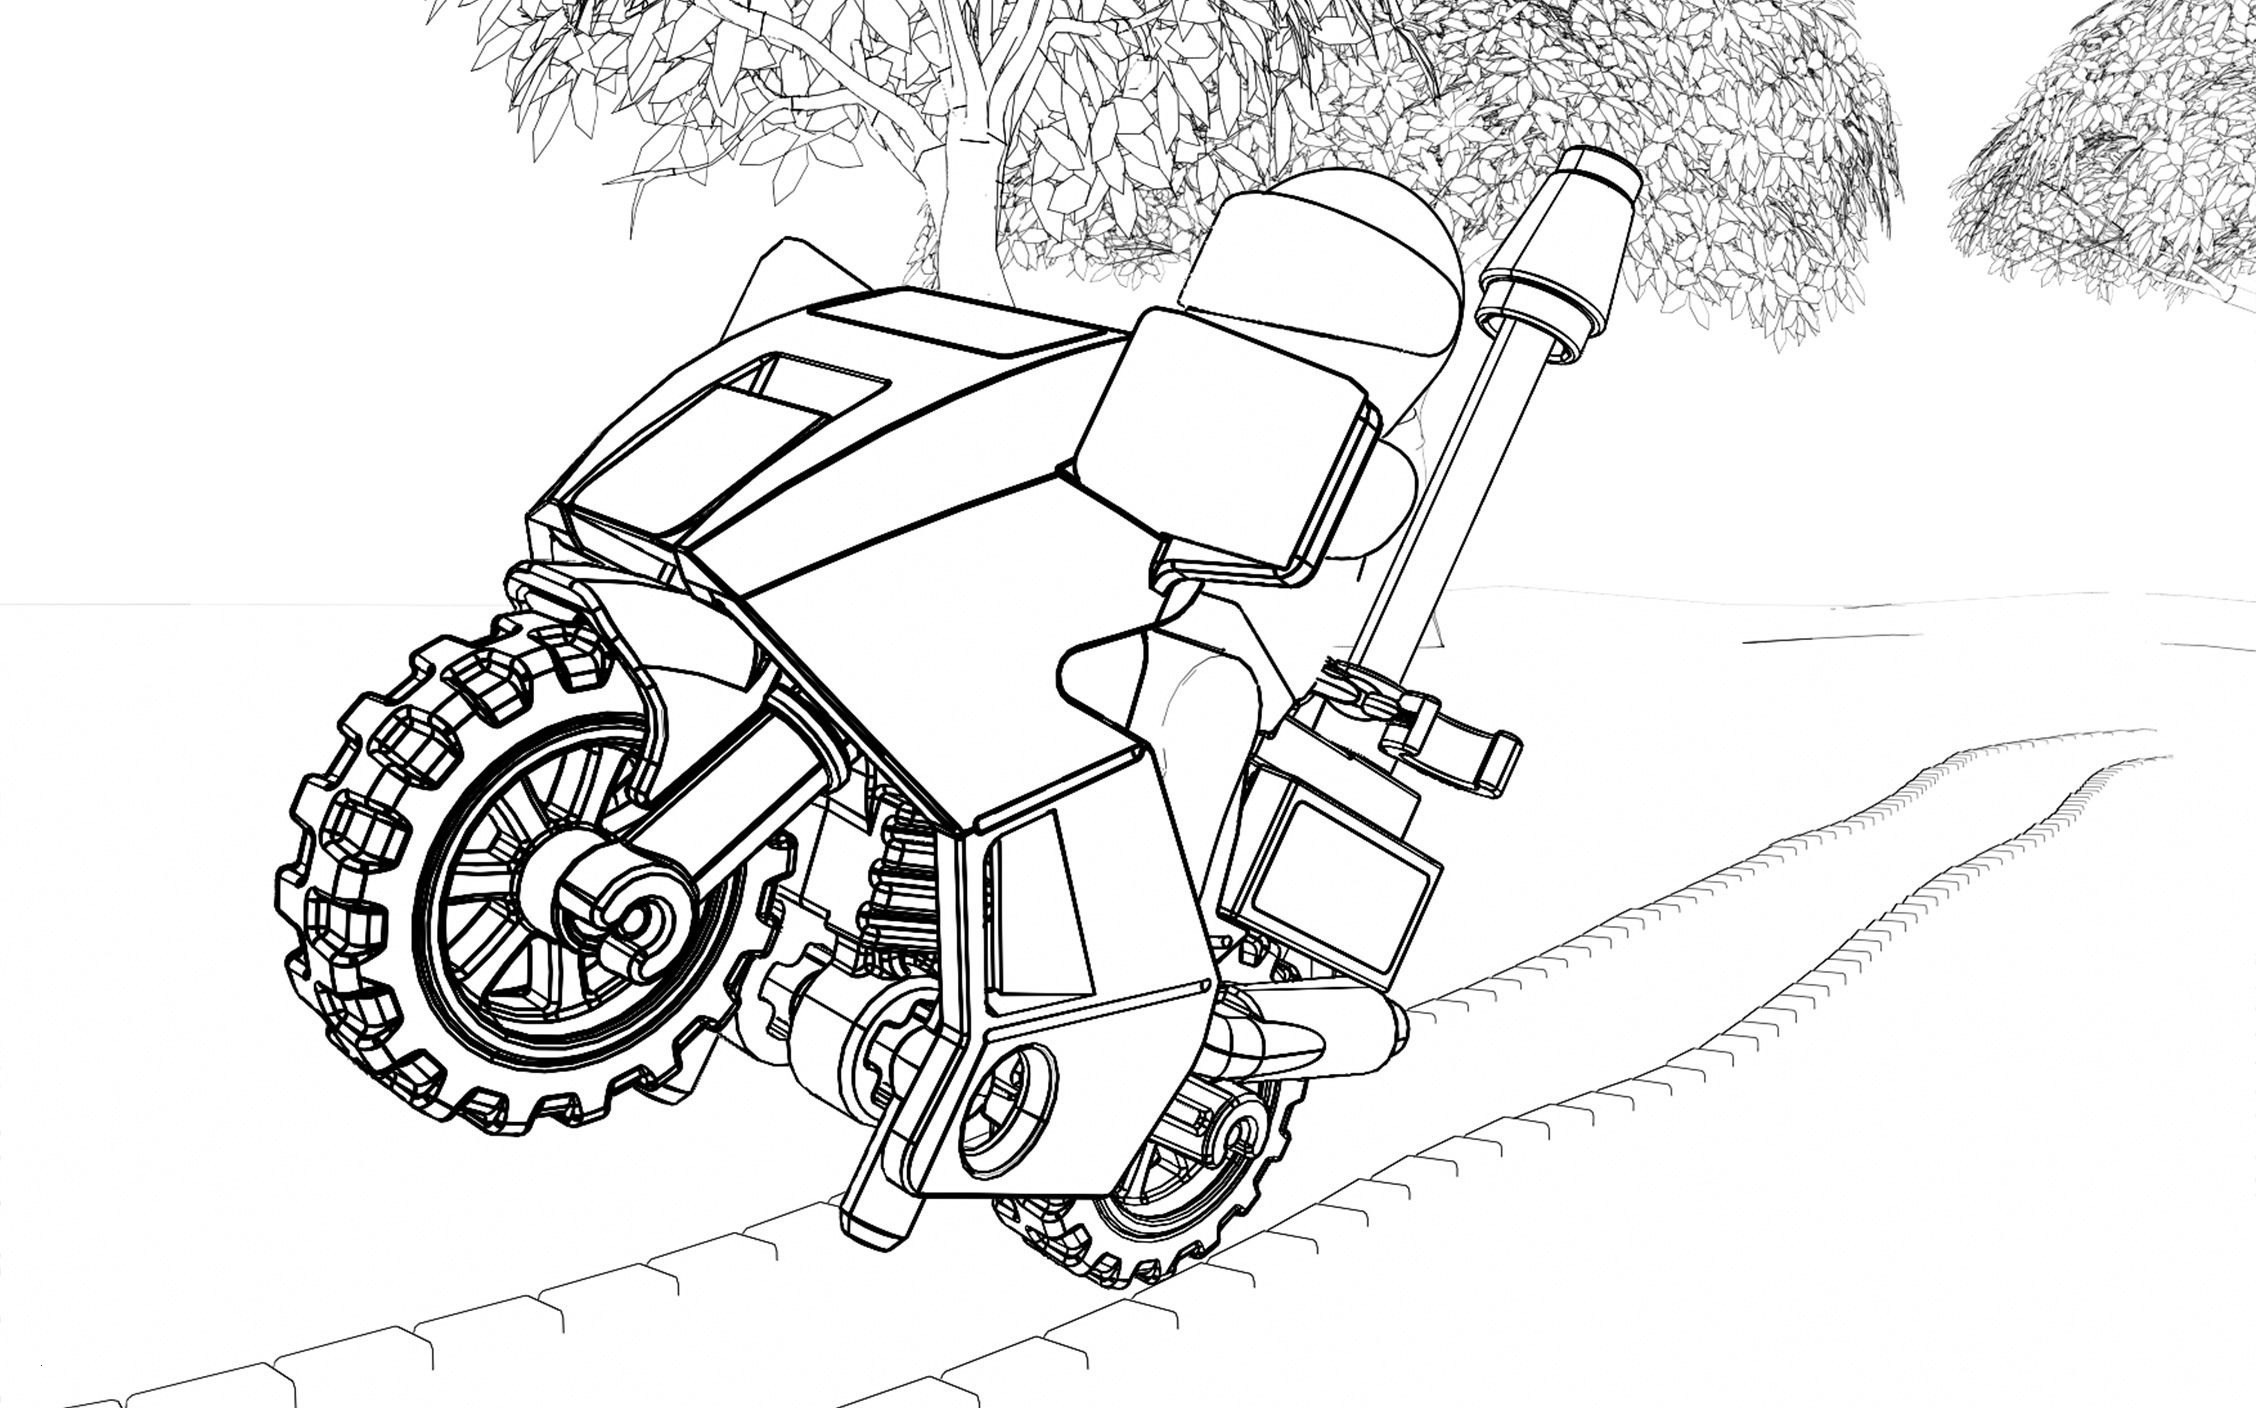 Playmobil Zum Ausmalen Neu Playmobil Ausmalbilder Kostenlos Einzigartig ford Mustang Sammlung